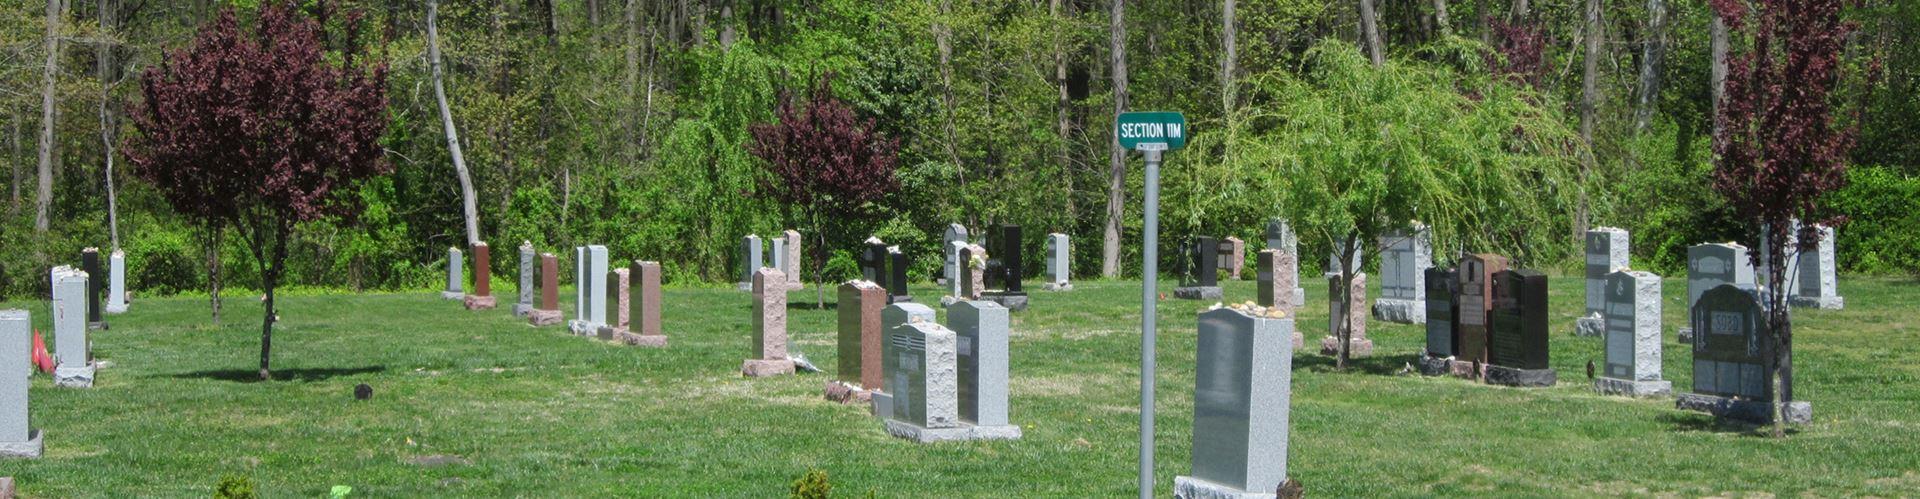 Locustwood Cemetery